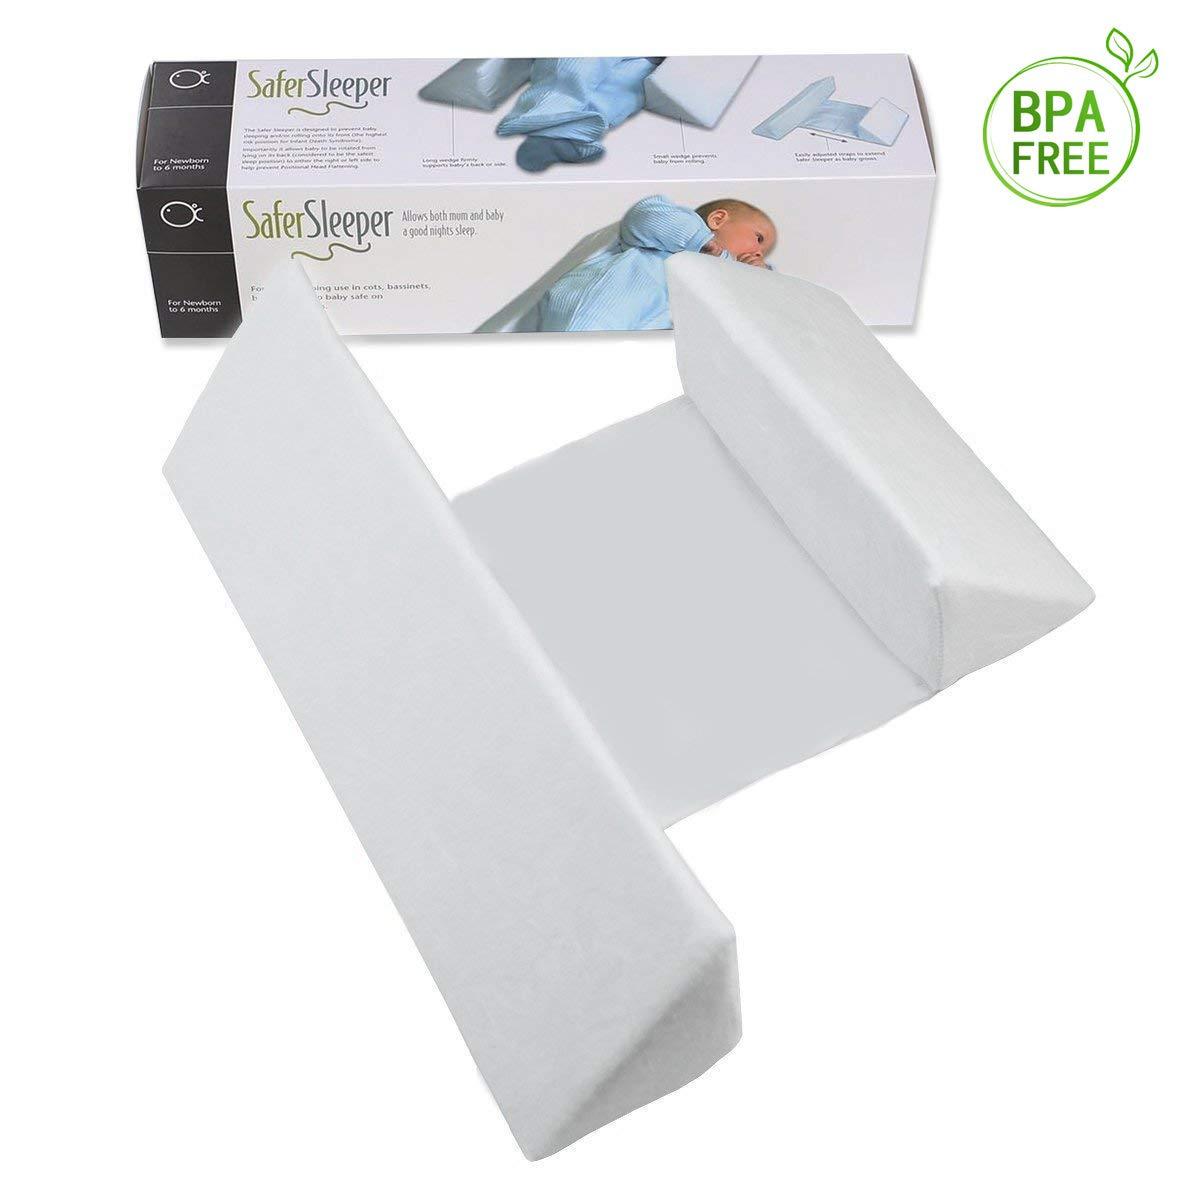 LANREN Newborns Infant Baby Sleep Pillow, Comfortable & Washable (White)